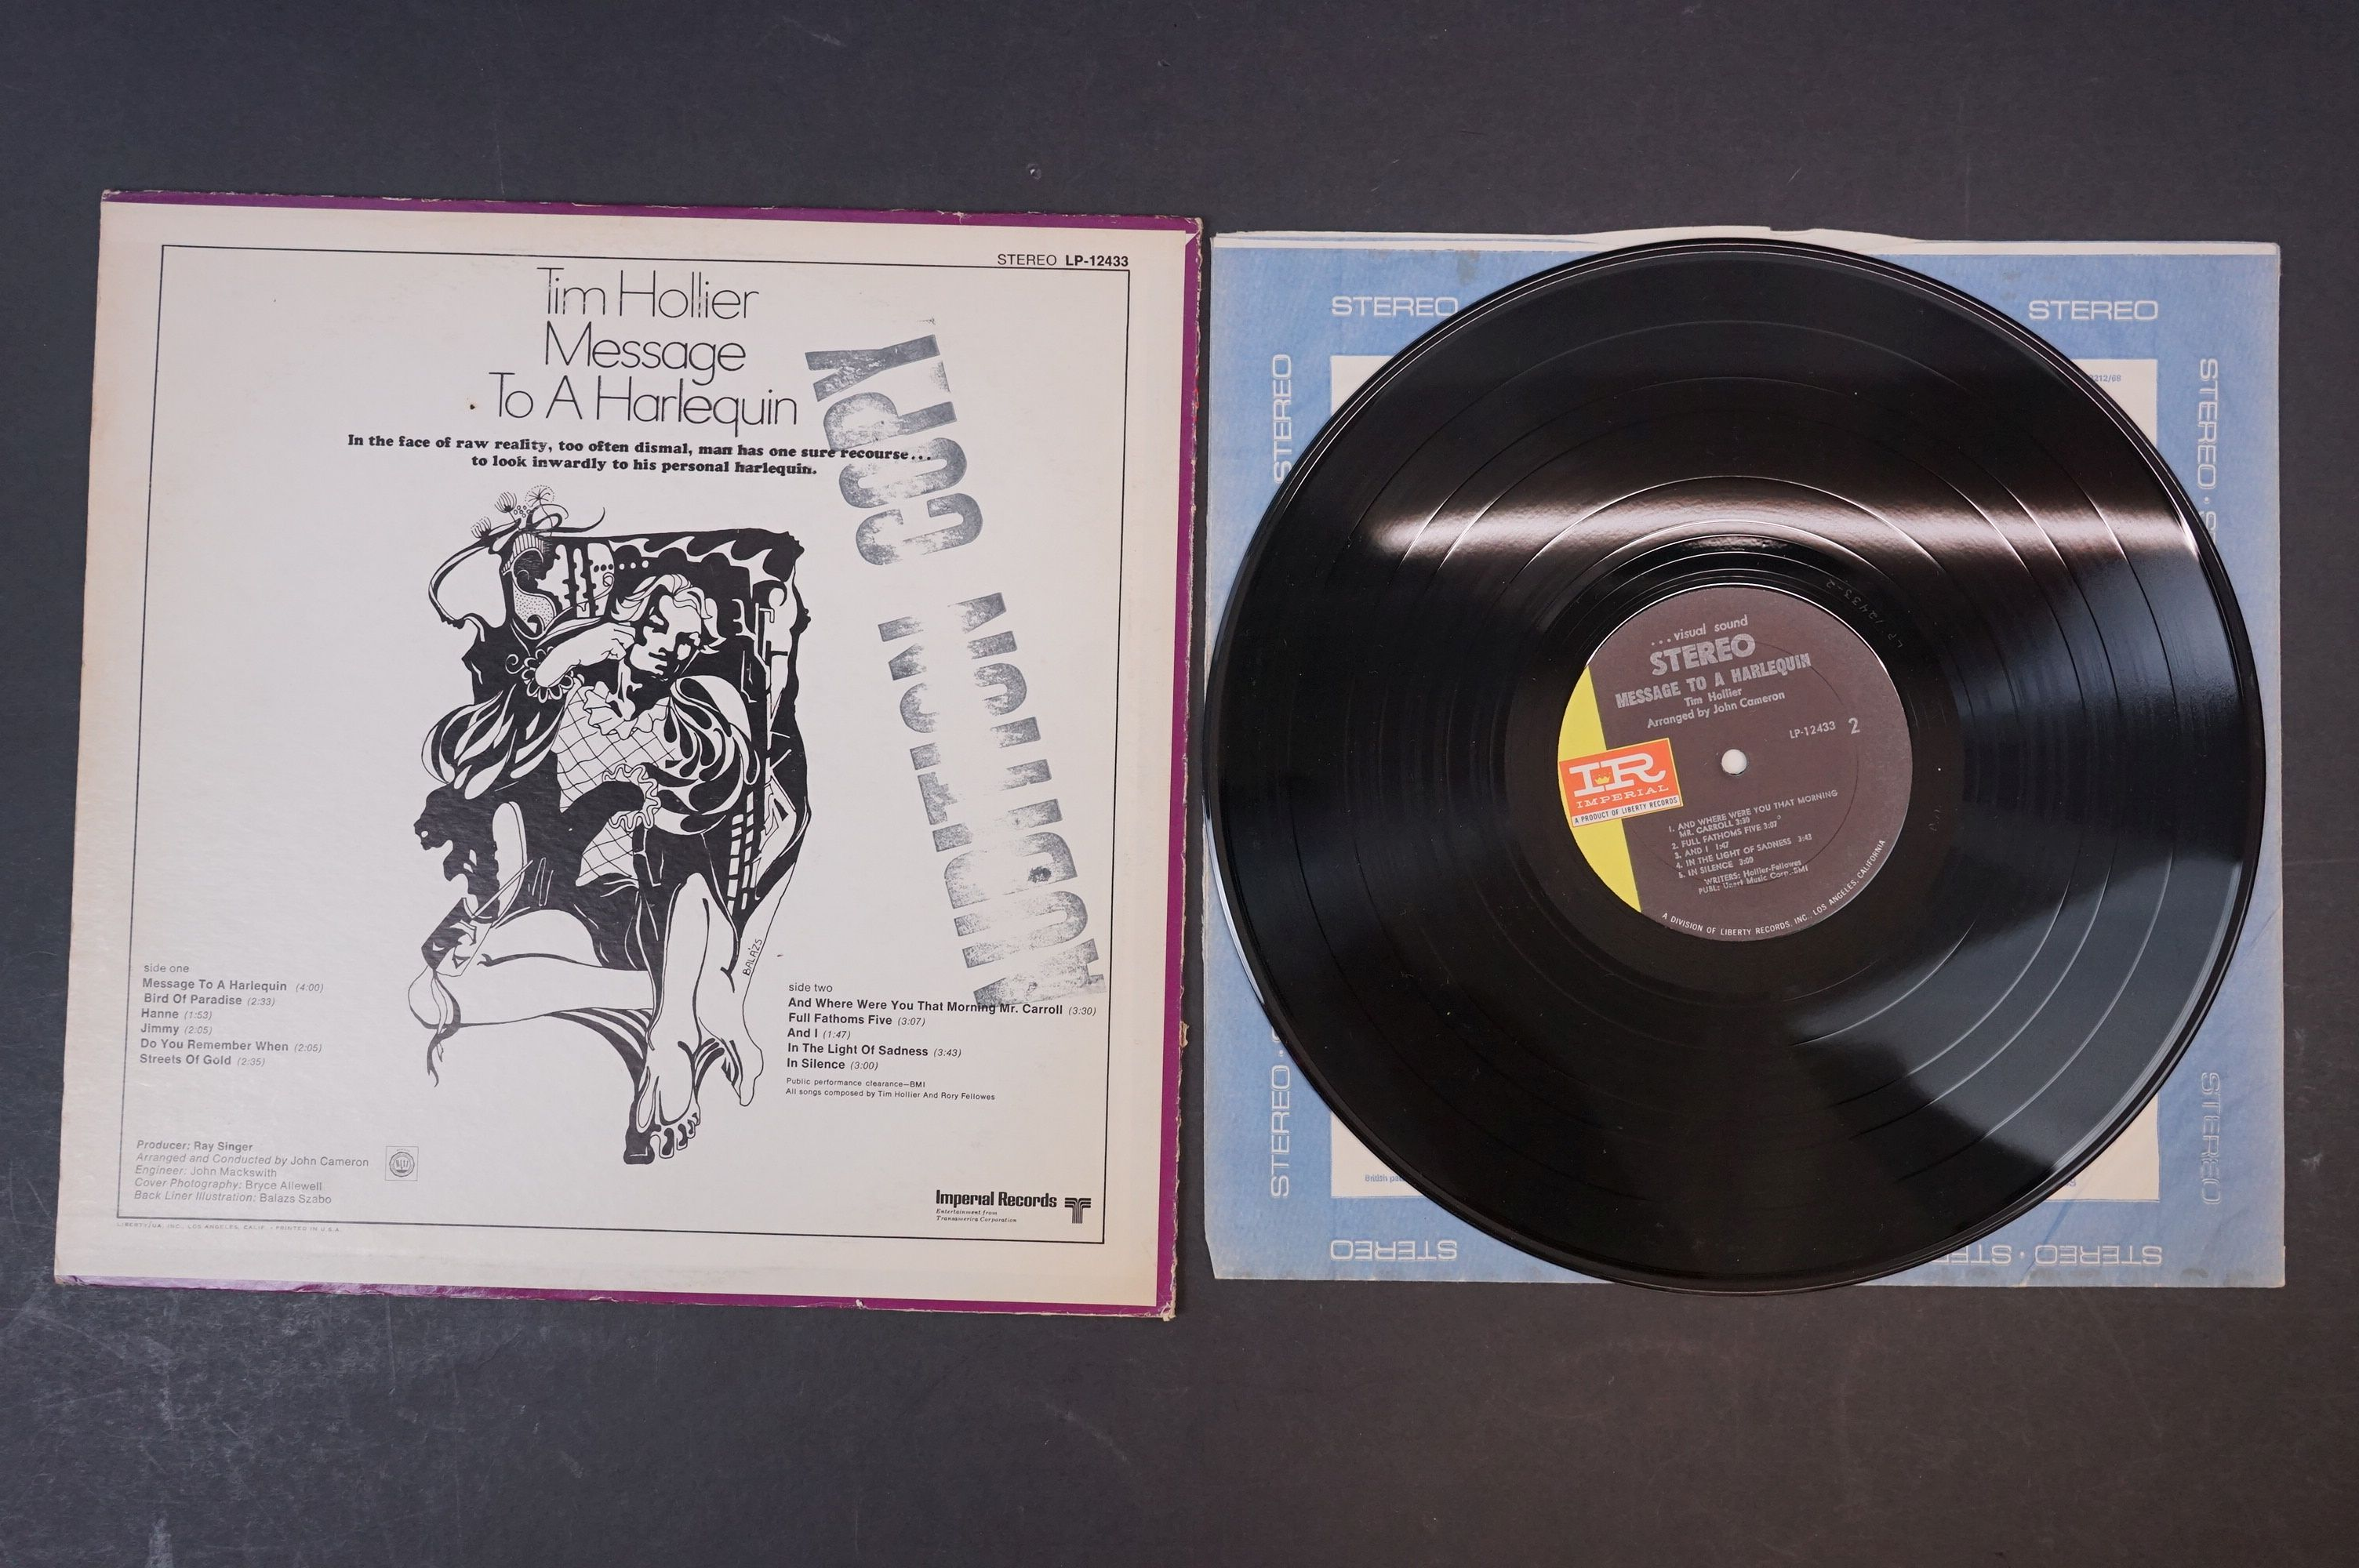 Vinyl - Acid Folk / Psych - Tim Hollier, Three scarce original pressing albums to include ?? - Image 7 of 7